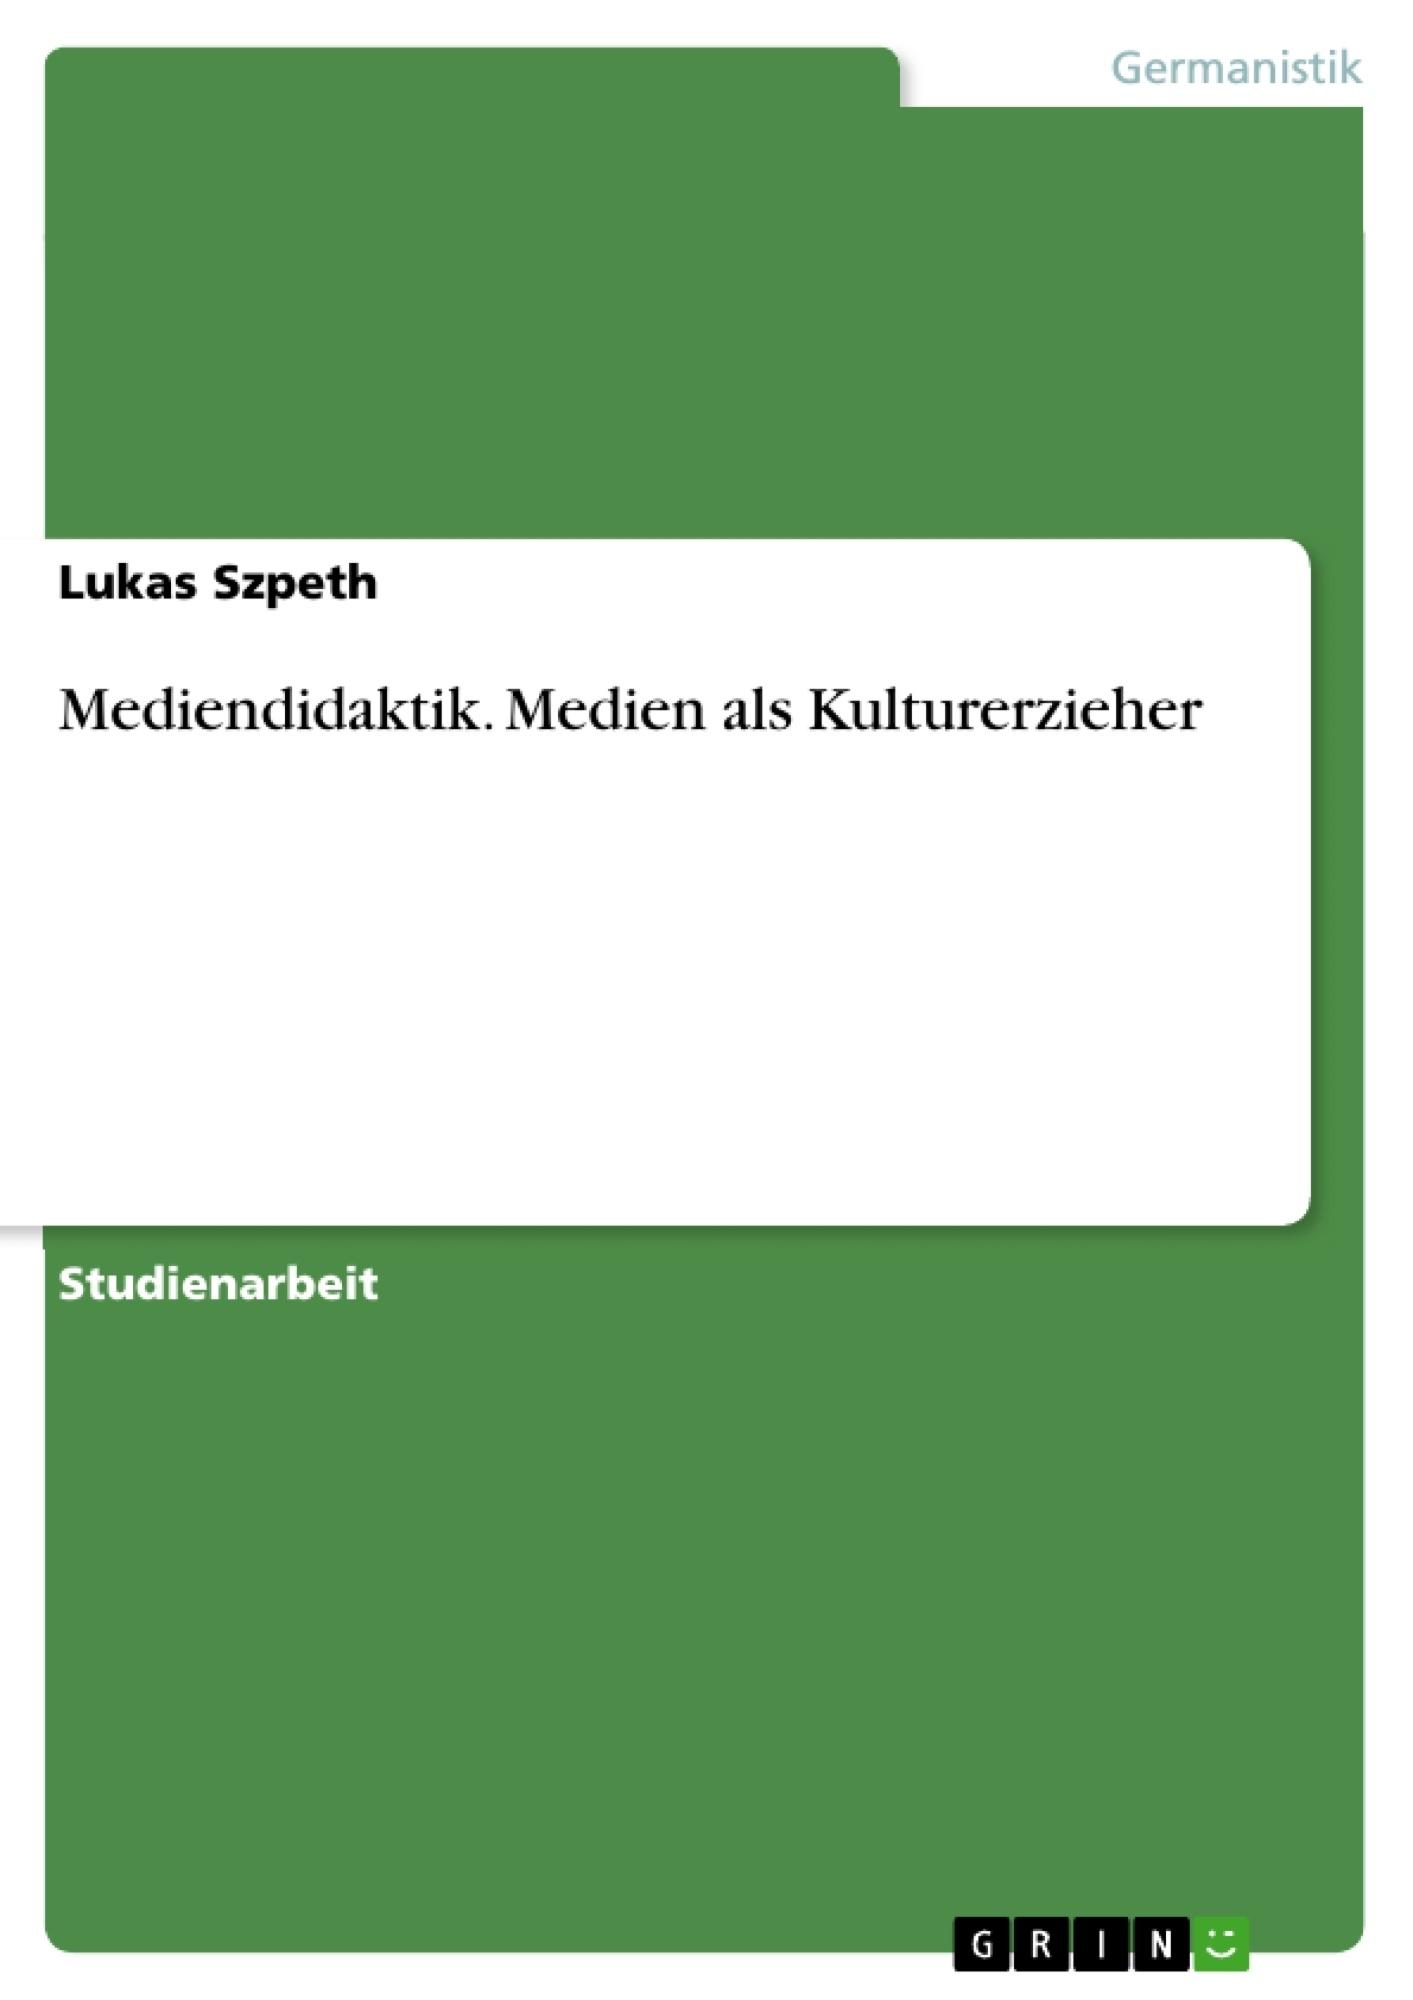 Titel: Mediendidaktik. Medien als Kulturerzieher